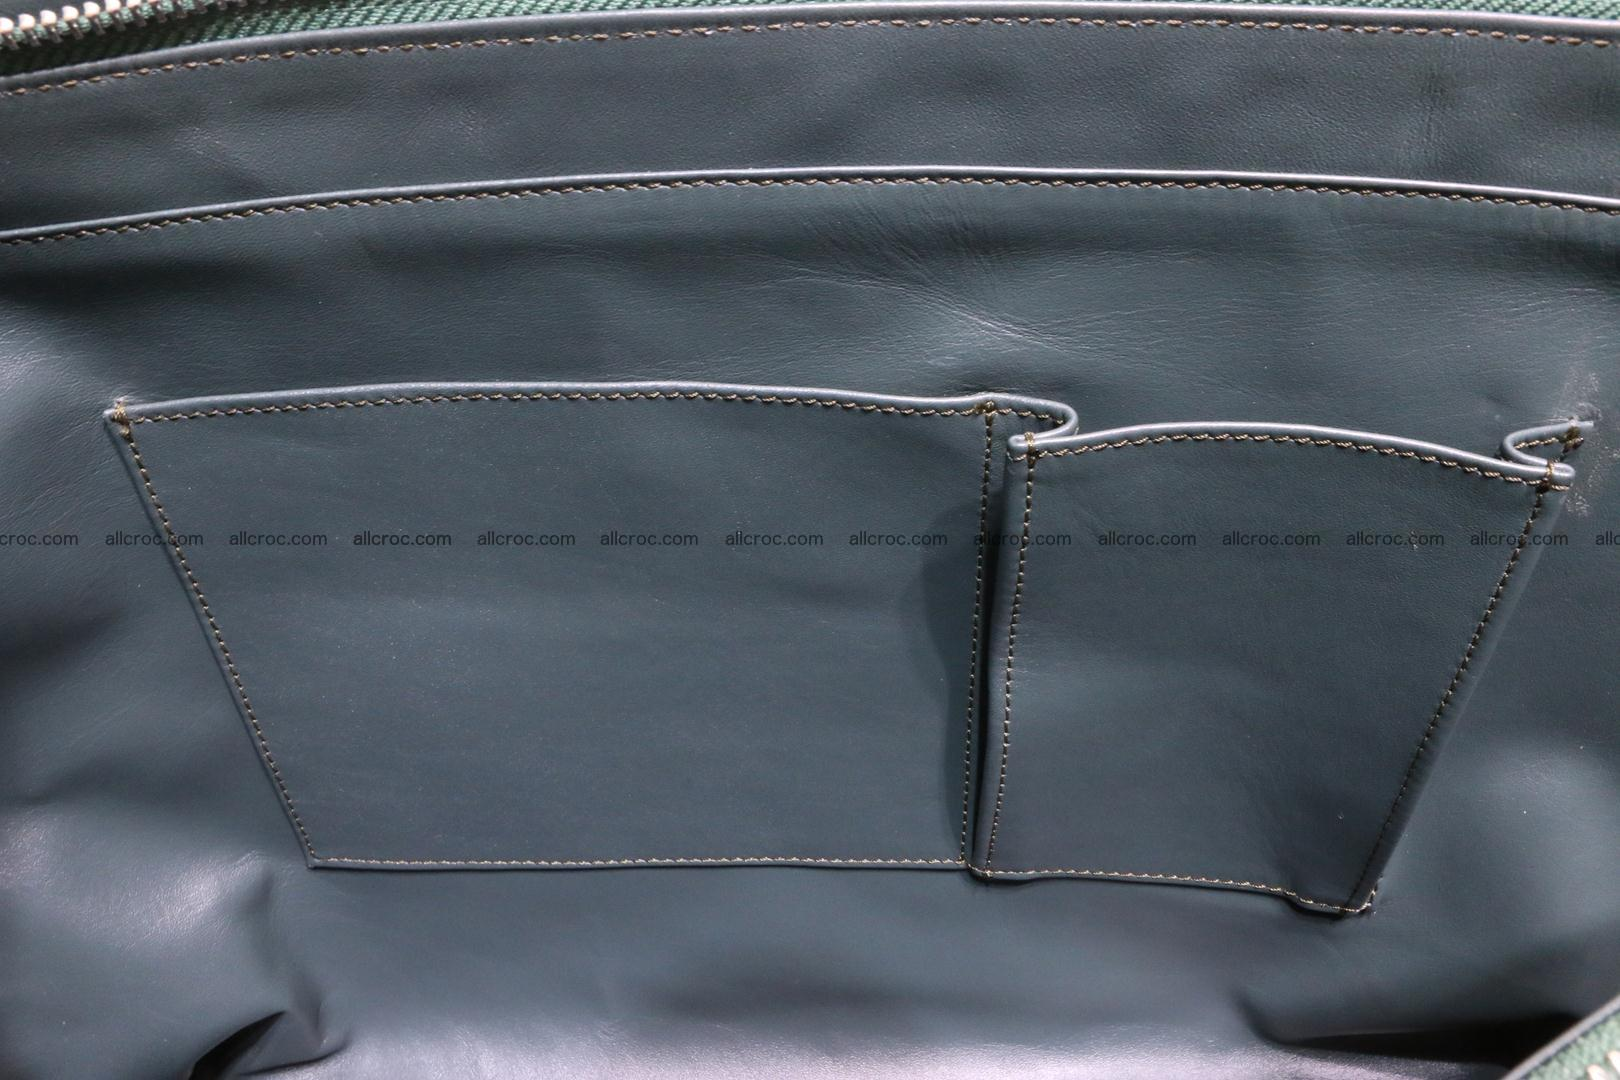 Genuine crocodile leather women's bag 064 Foto 13